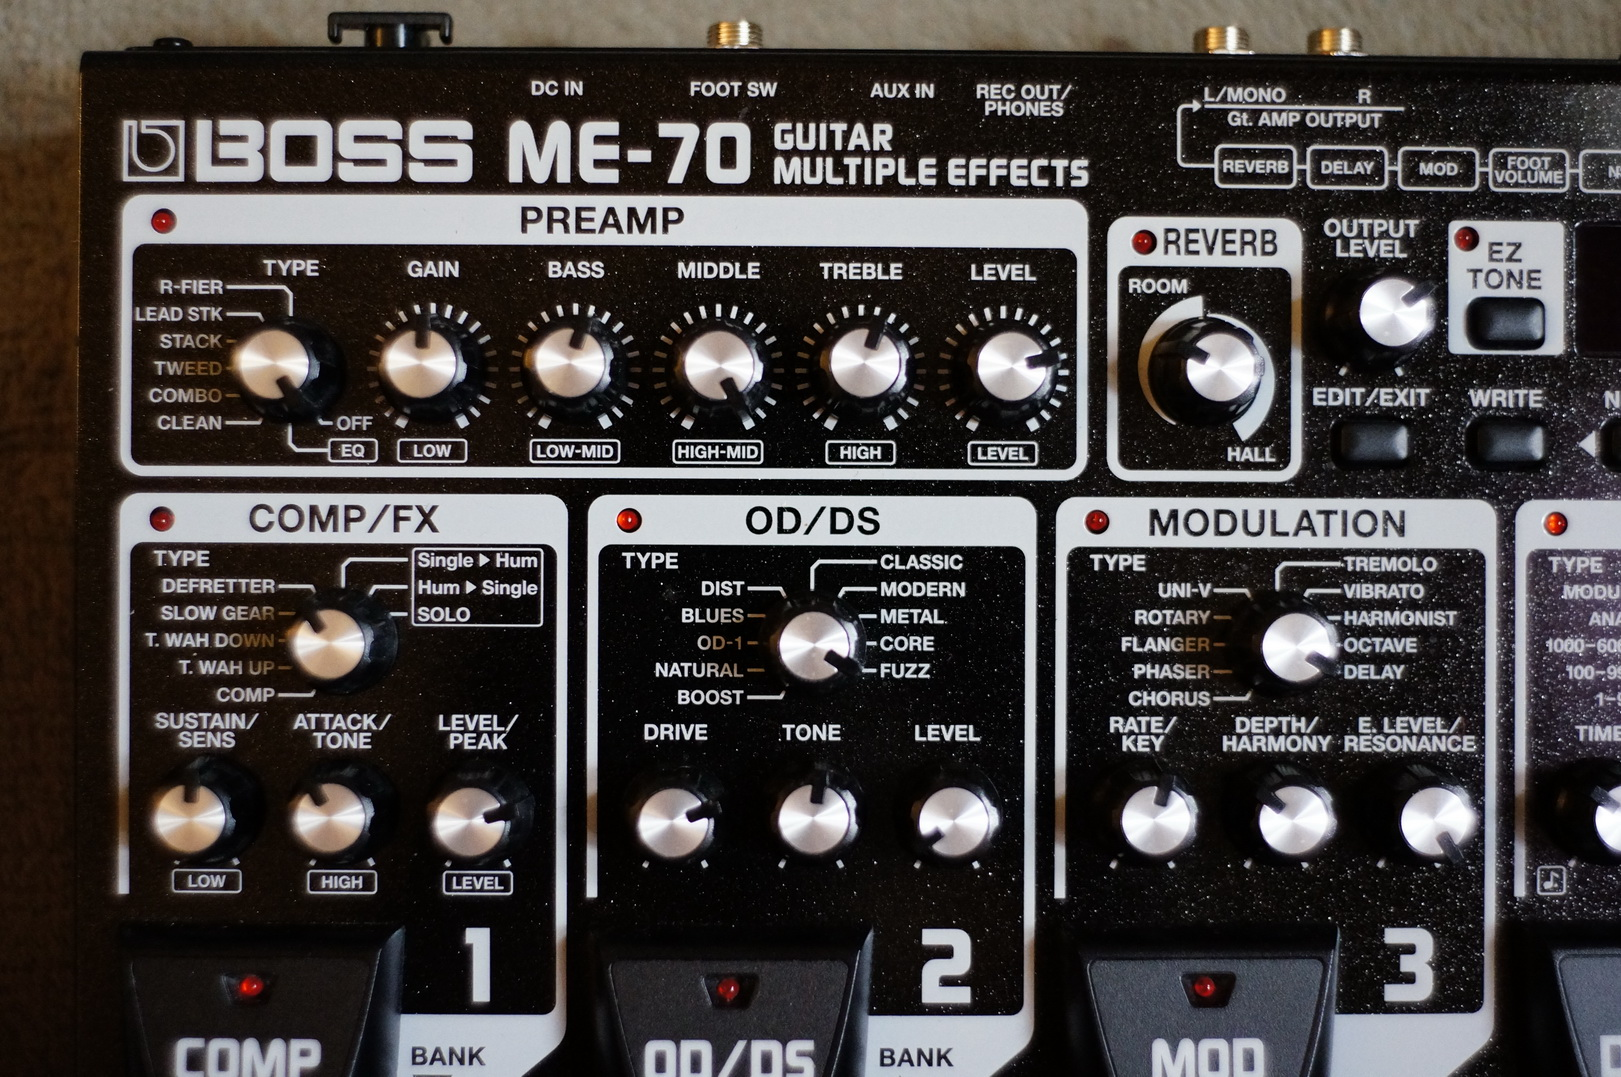 Boss ME-70 Manuals